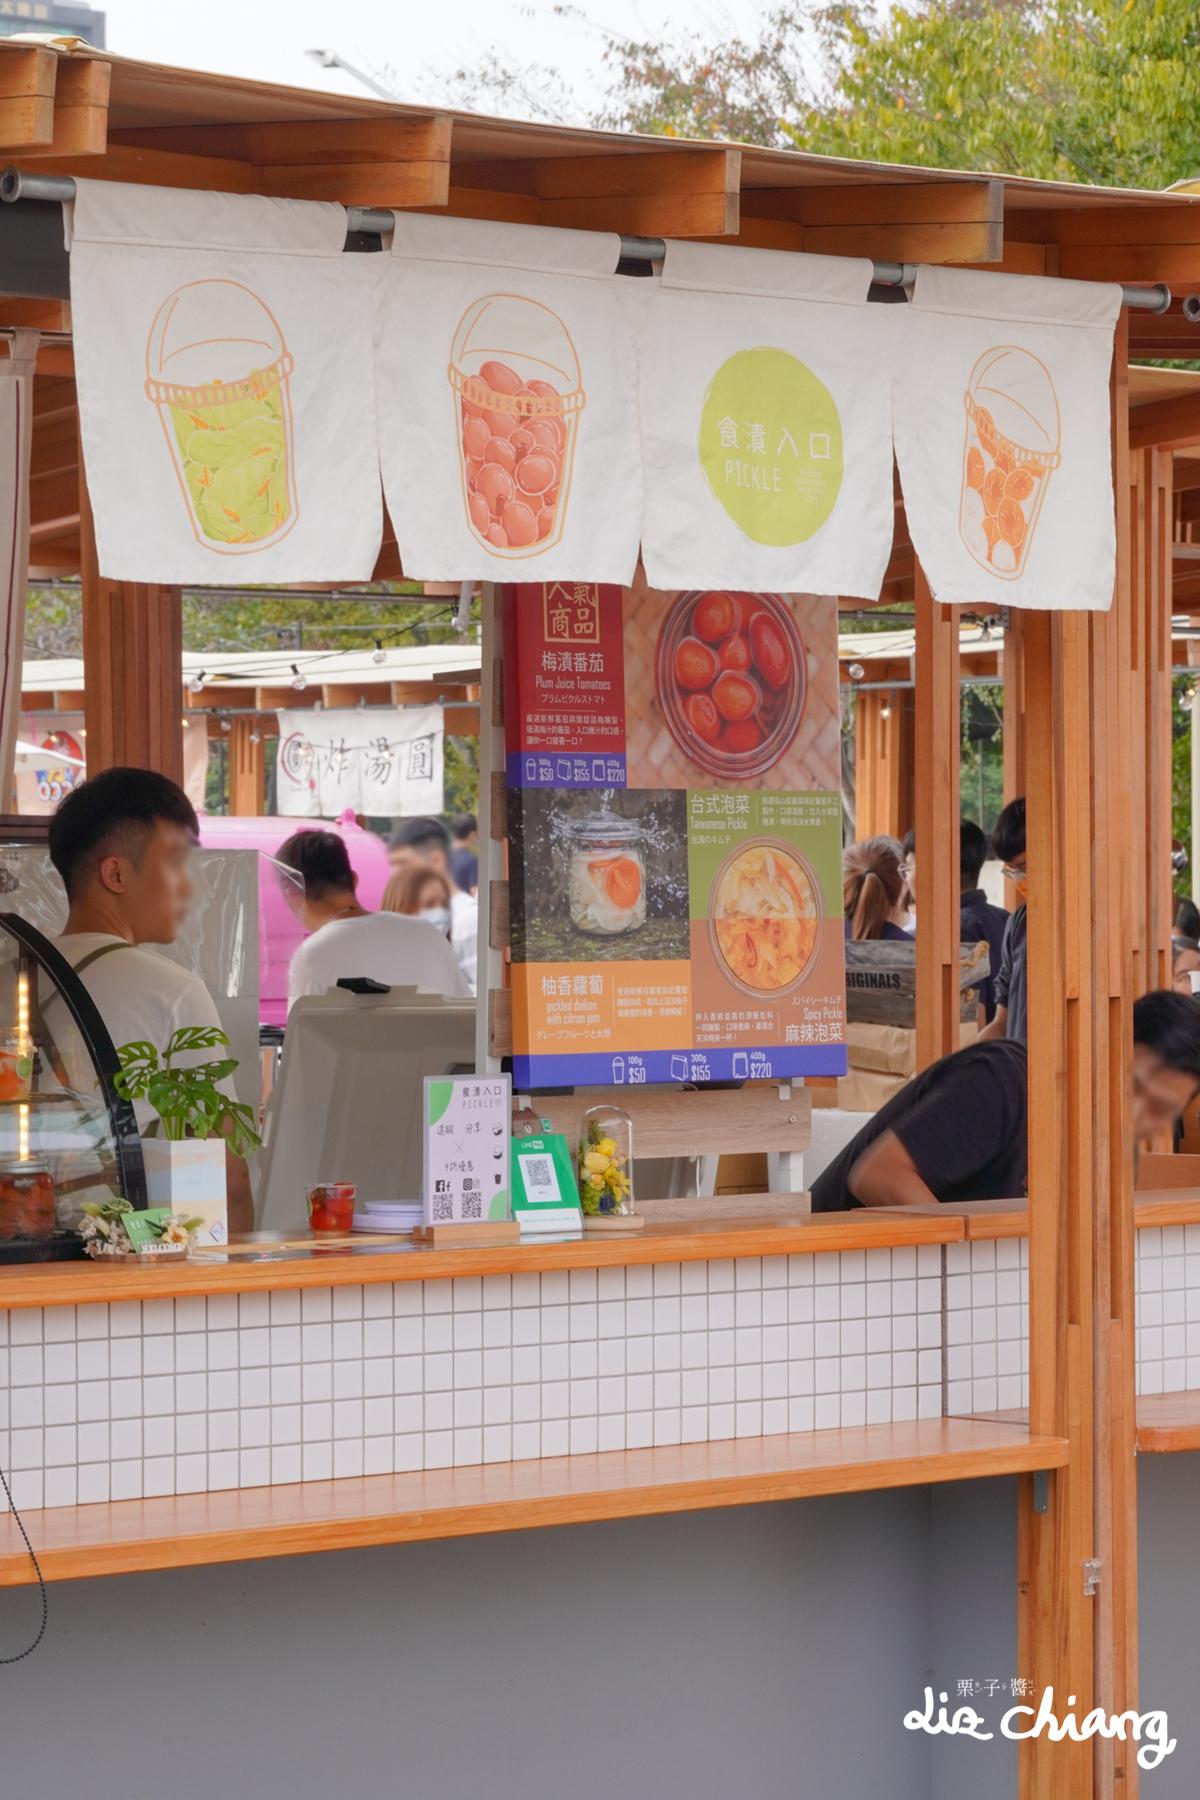 DSC04769Liz chiang 栗子醬-美食部落客-料理部落客